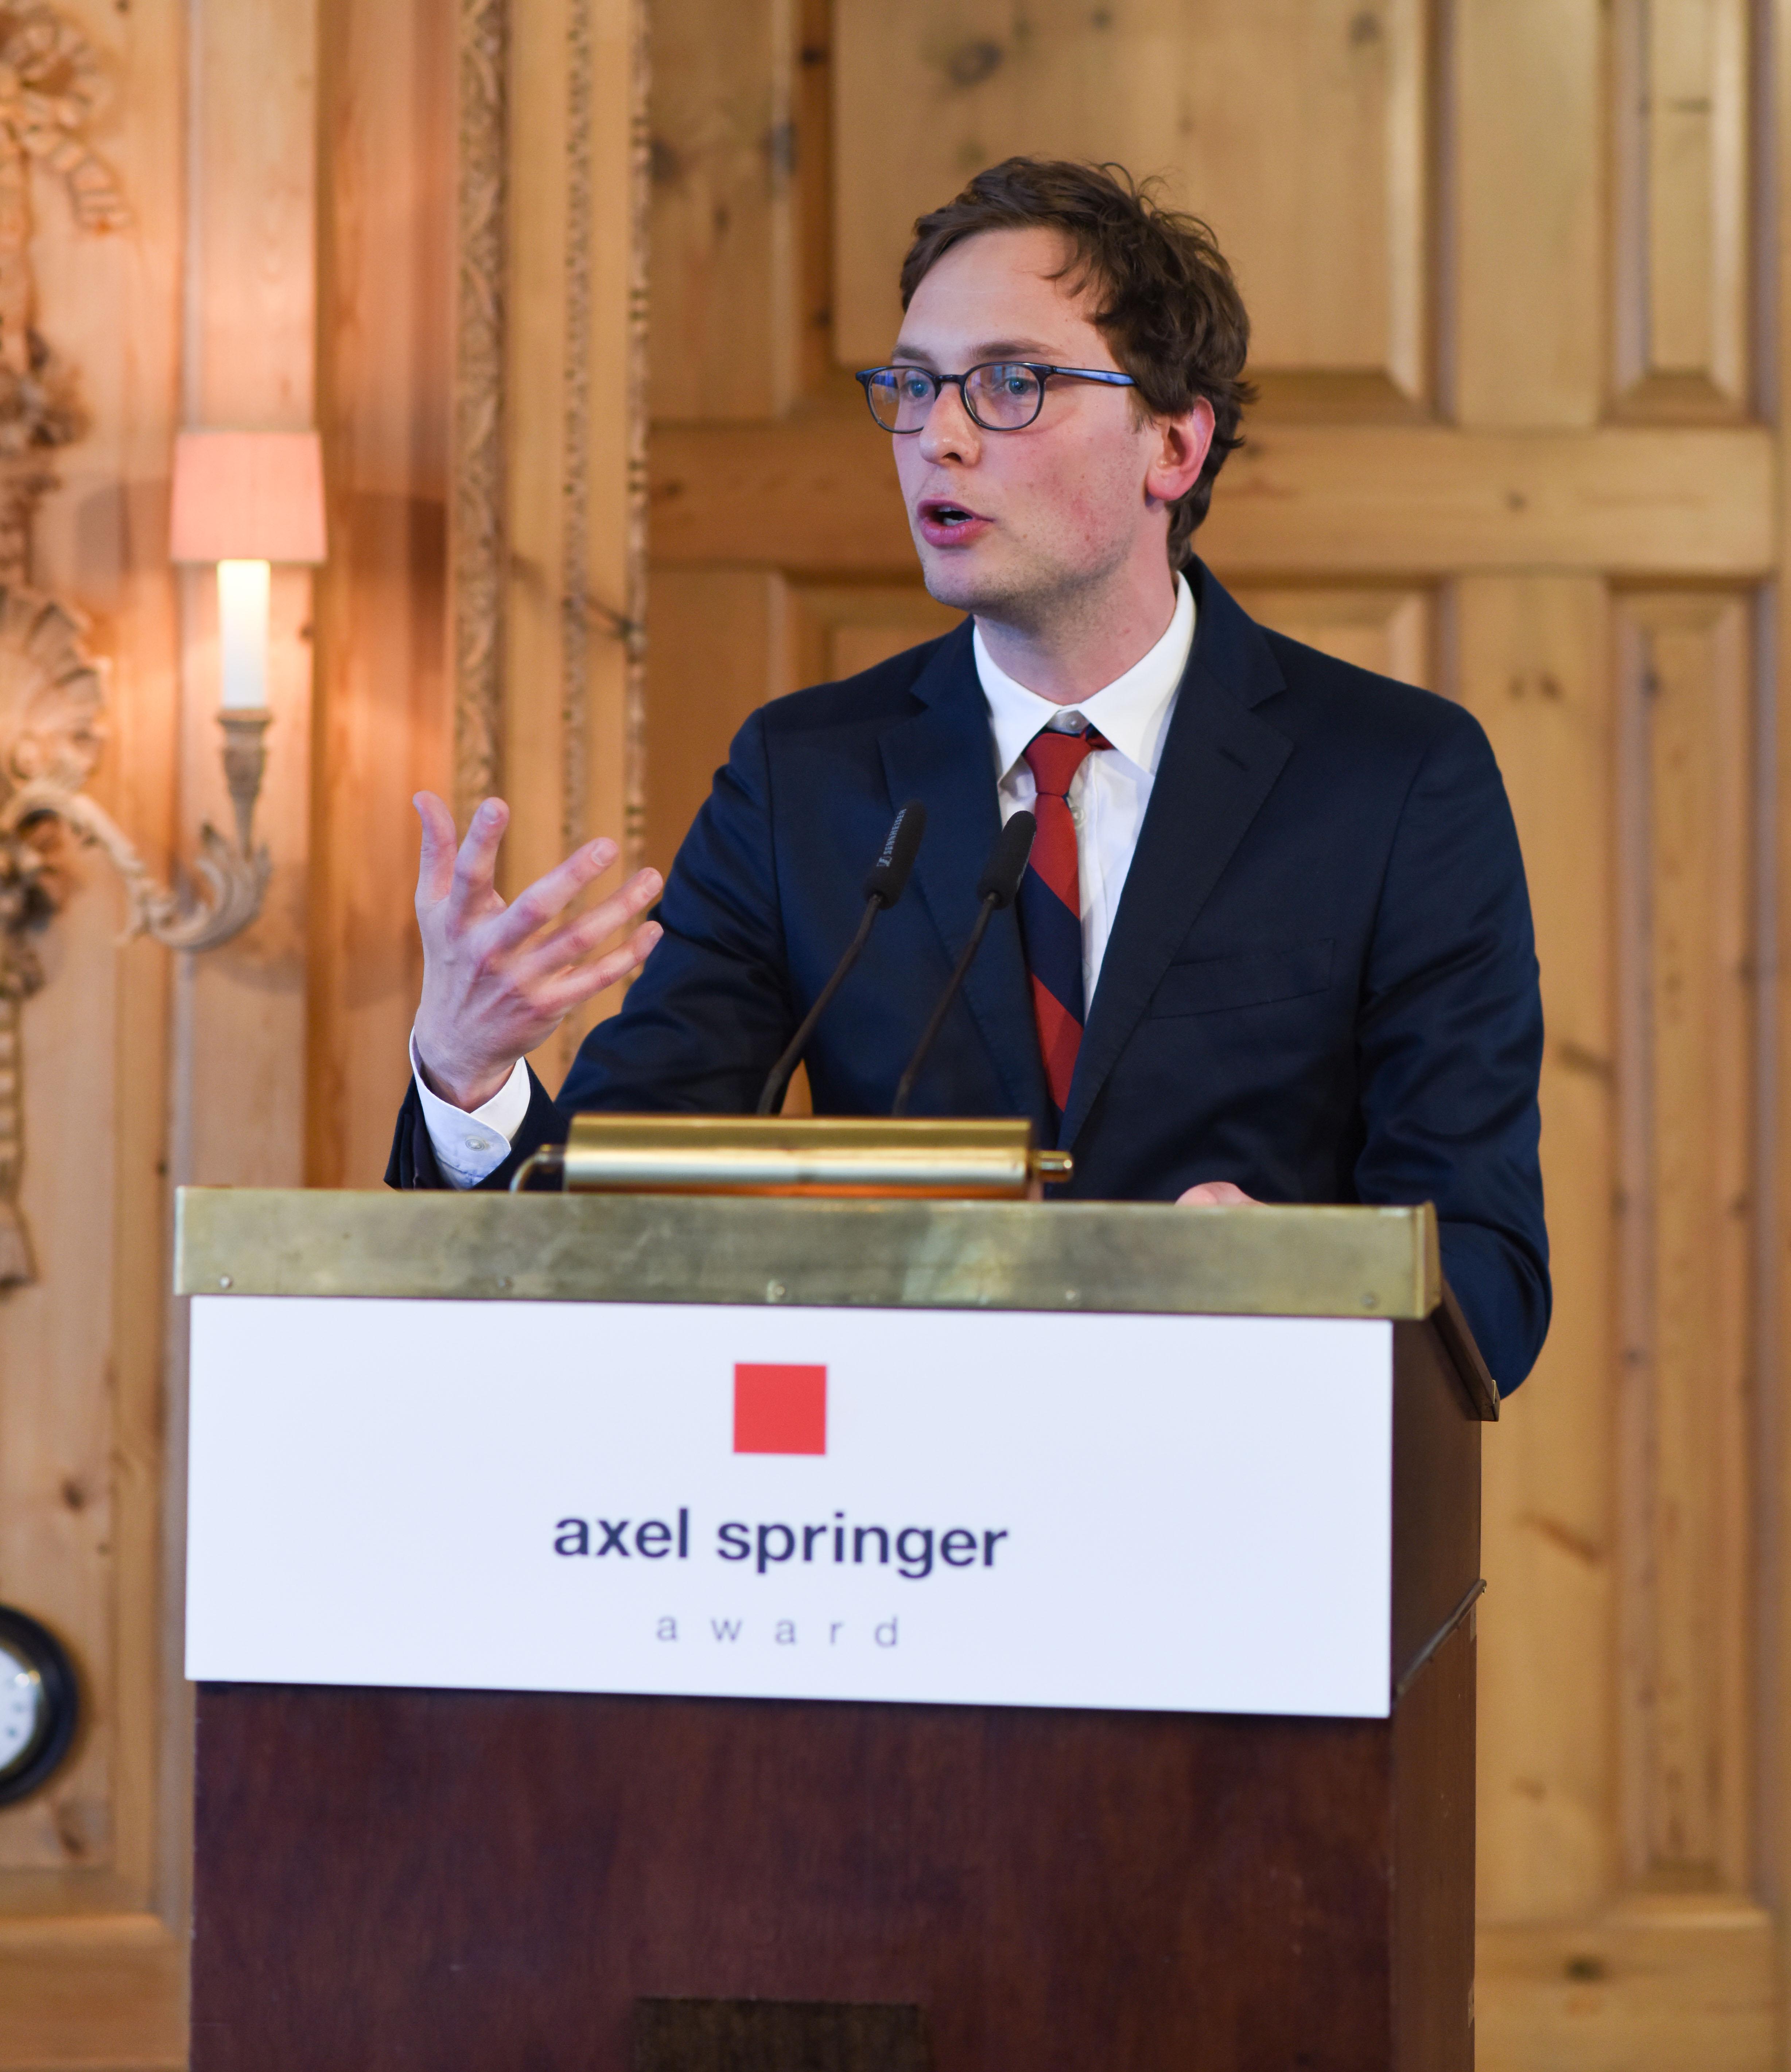 Berlin, 2.5.2017 Verleihung des Axel-Springer Award an Sir Tim Bernes-Lee. Unter den Gästen: Festredner Prof Sascha Friesike